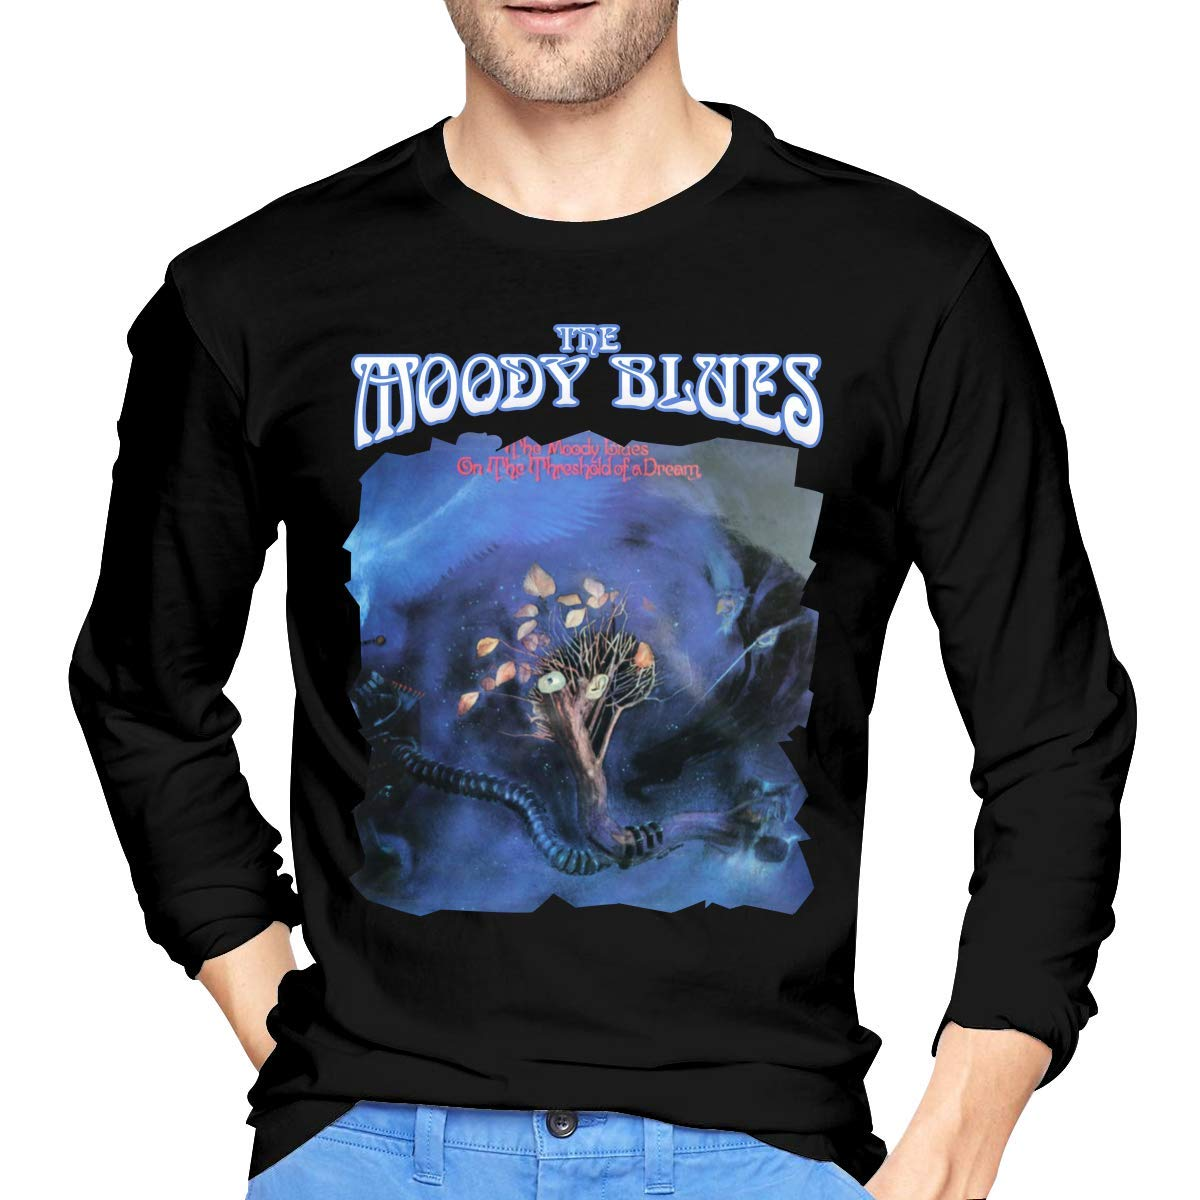 Fssatung S The Moody Blues On The Threshold Of A Dream Tshirt Black